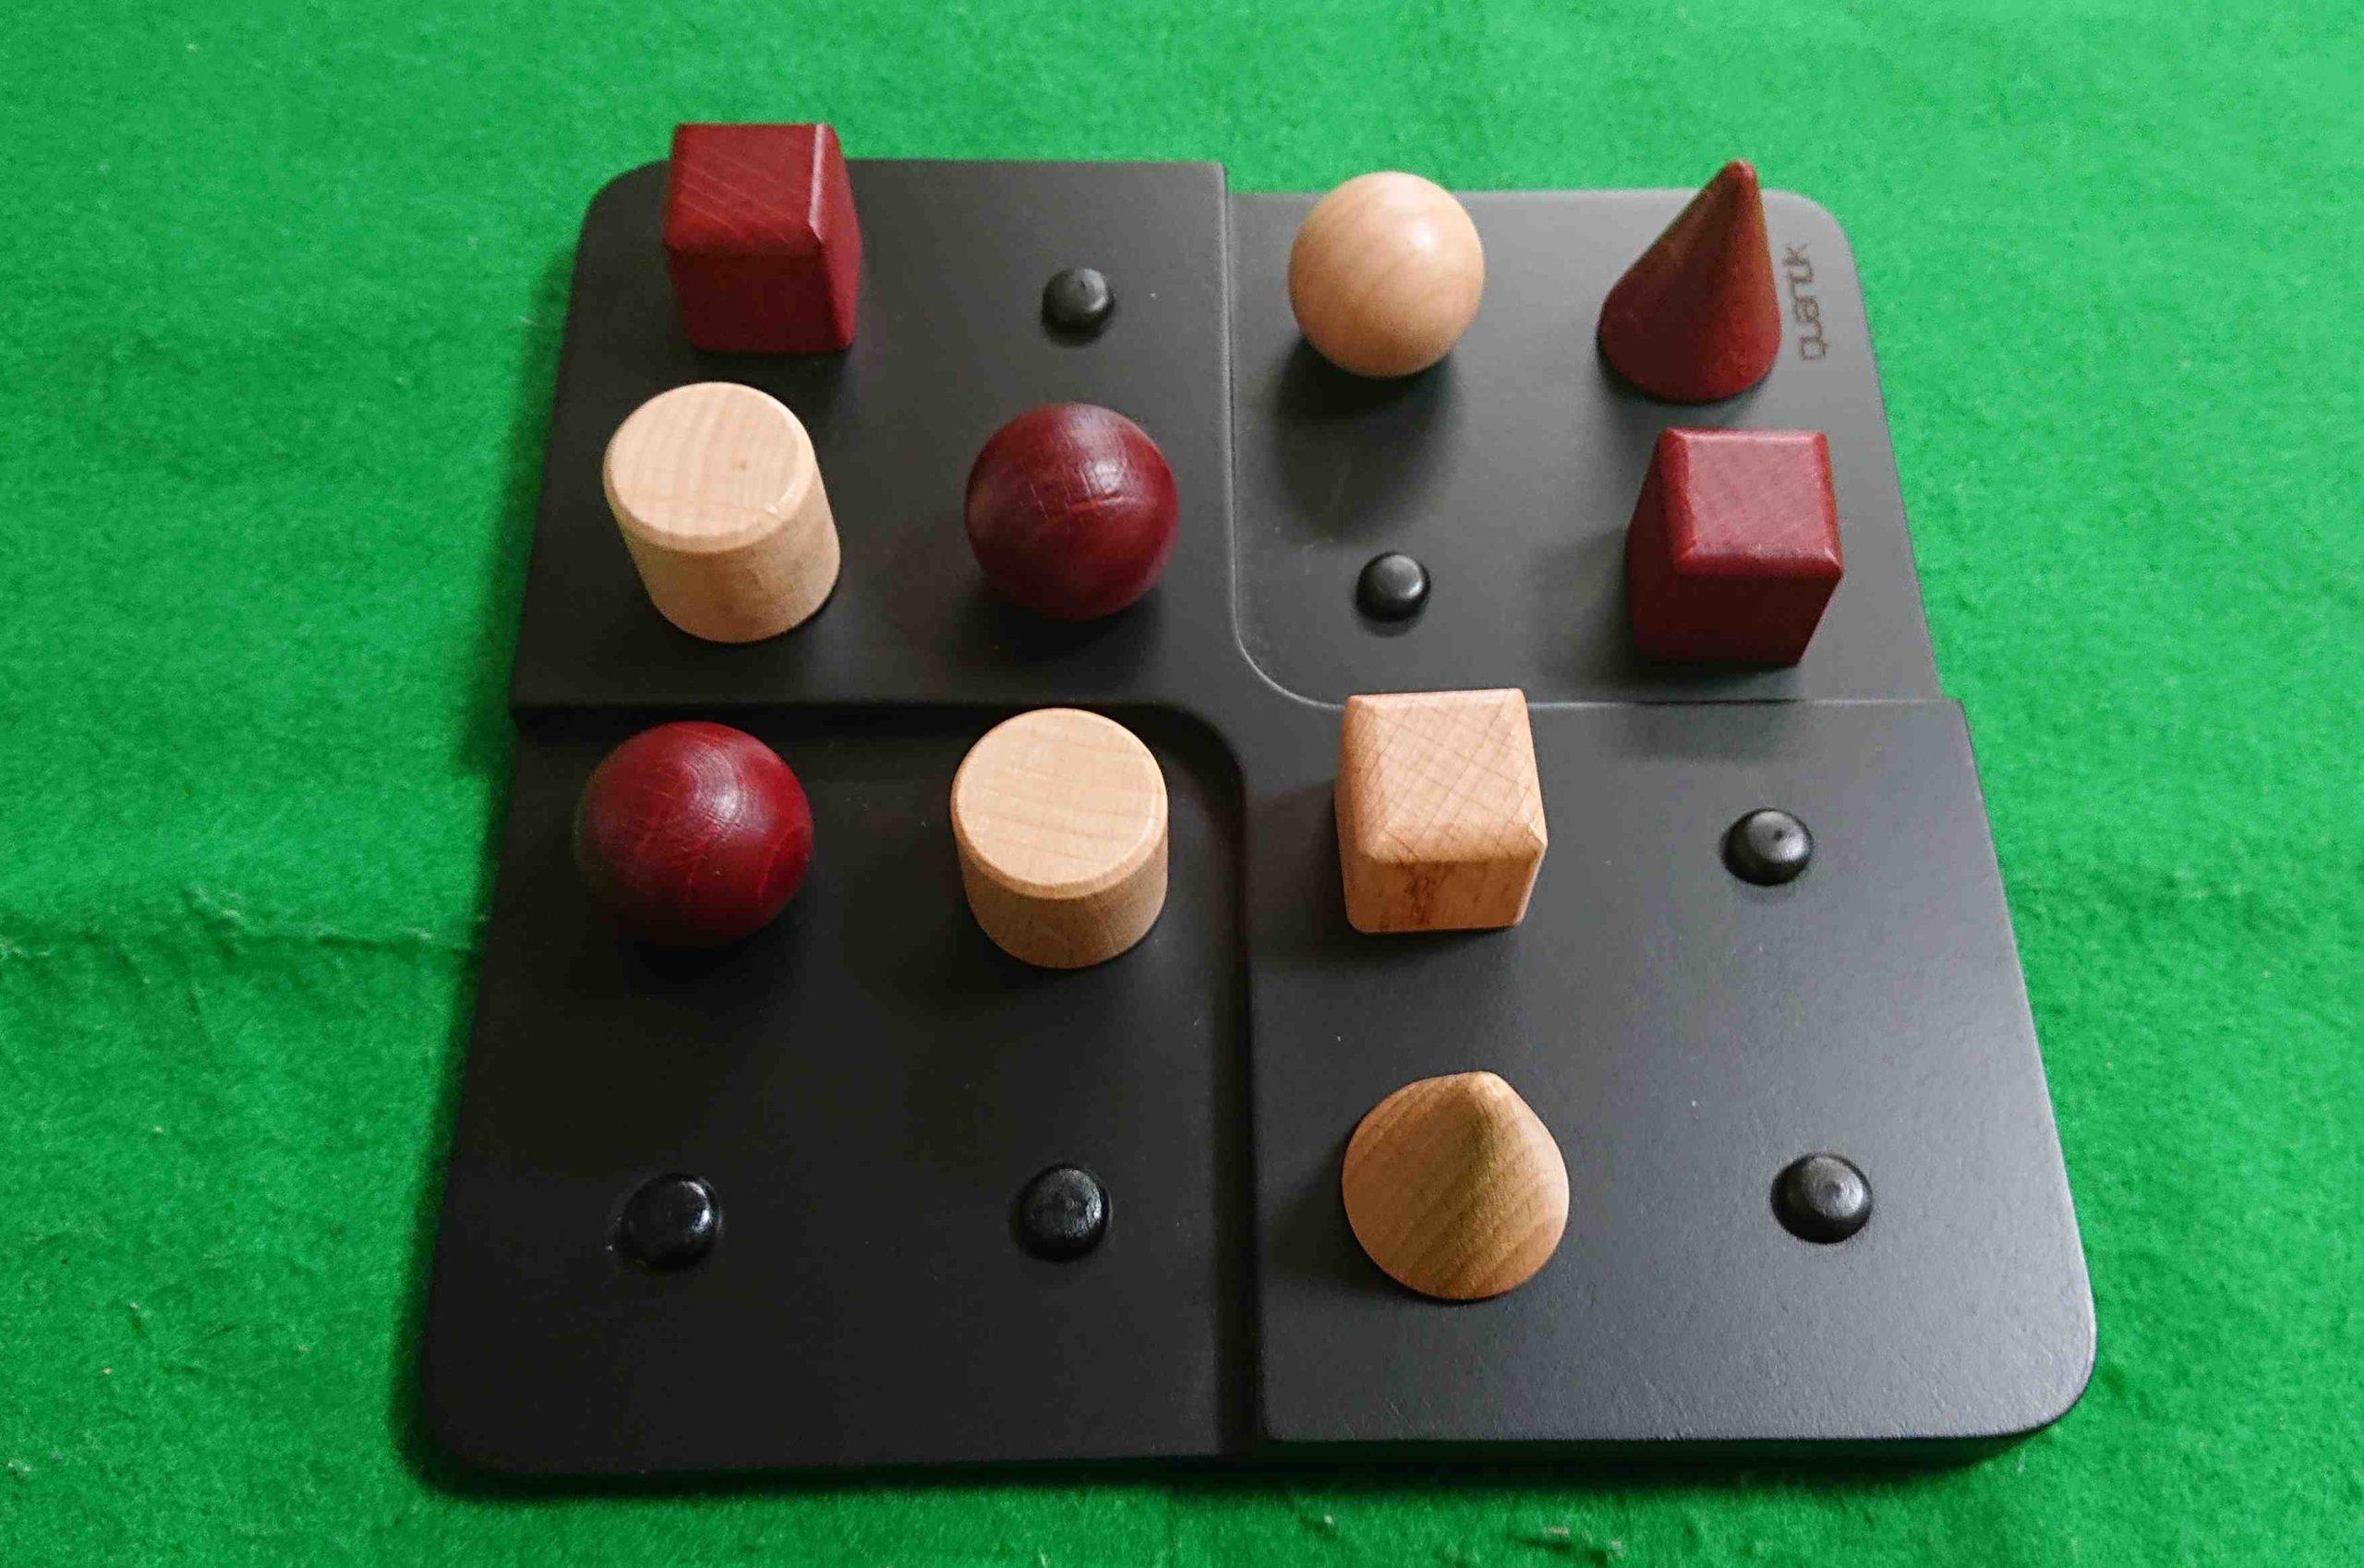 QUANTIK(クアンティック) ルール&レビュー アブストラクト系 ボードゲーム